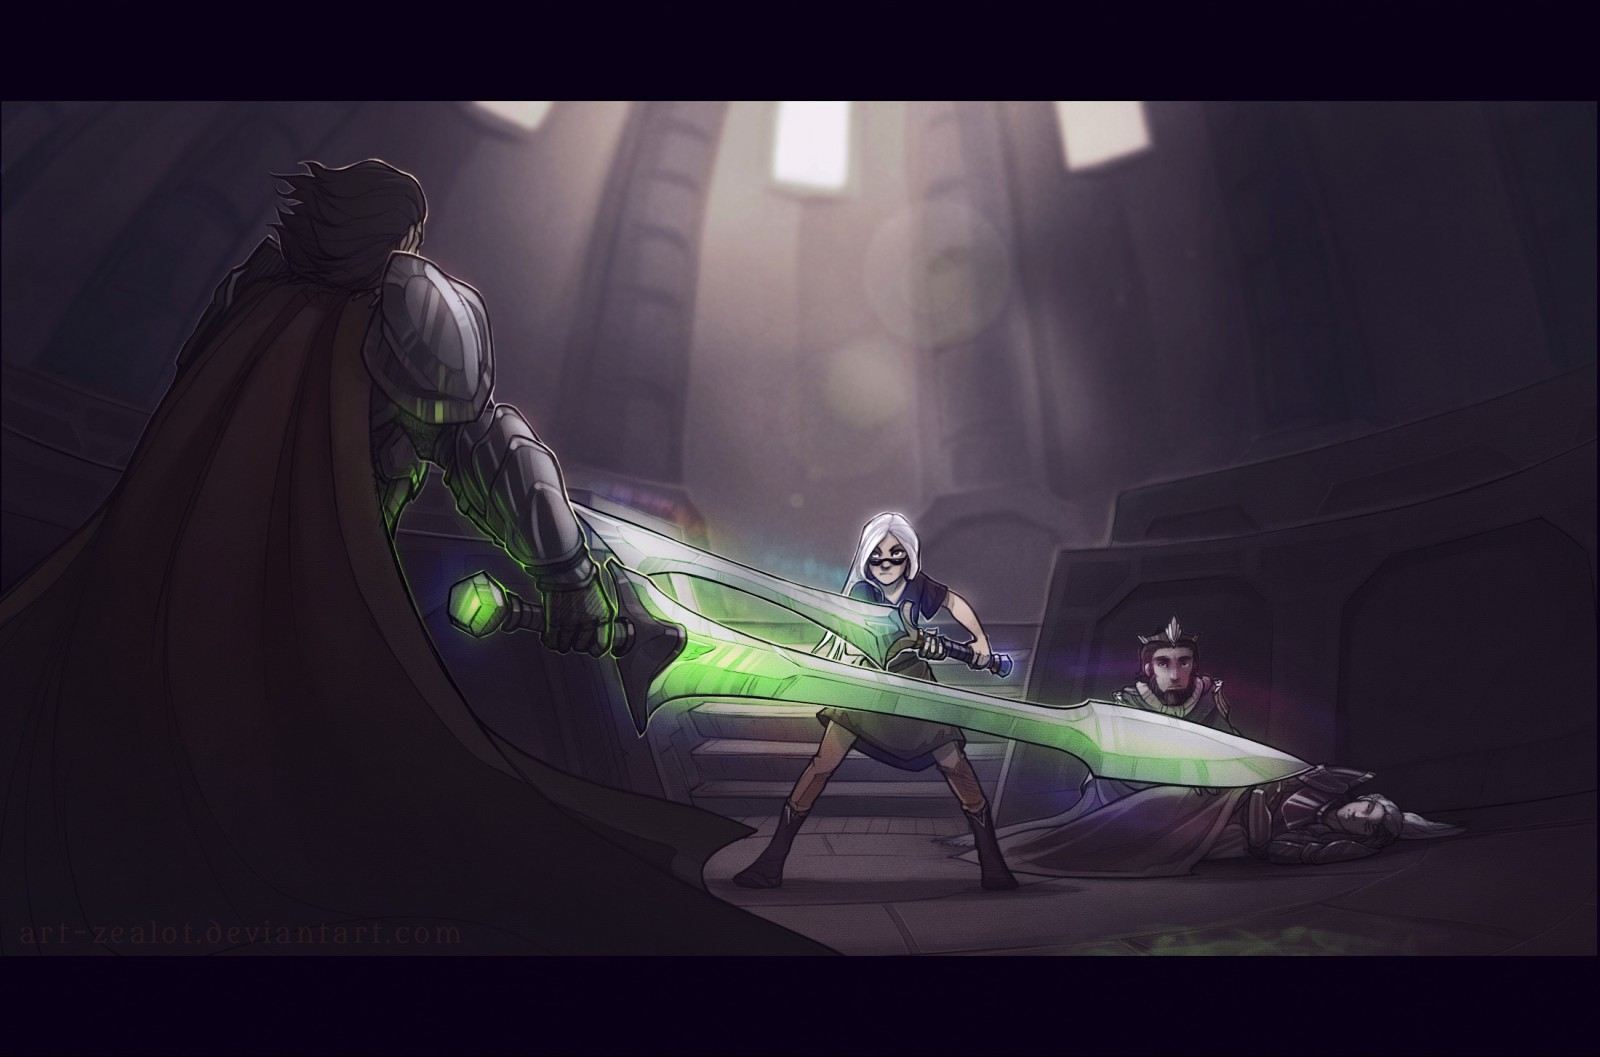 Vs the Knights of Crystallia